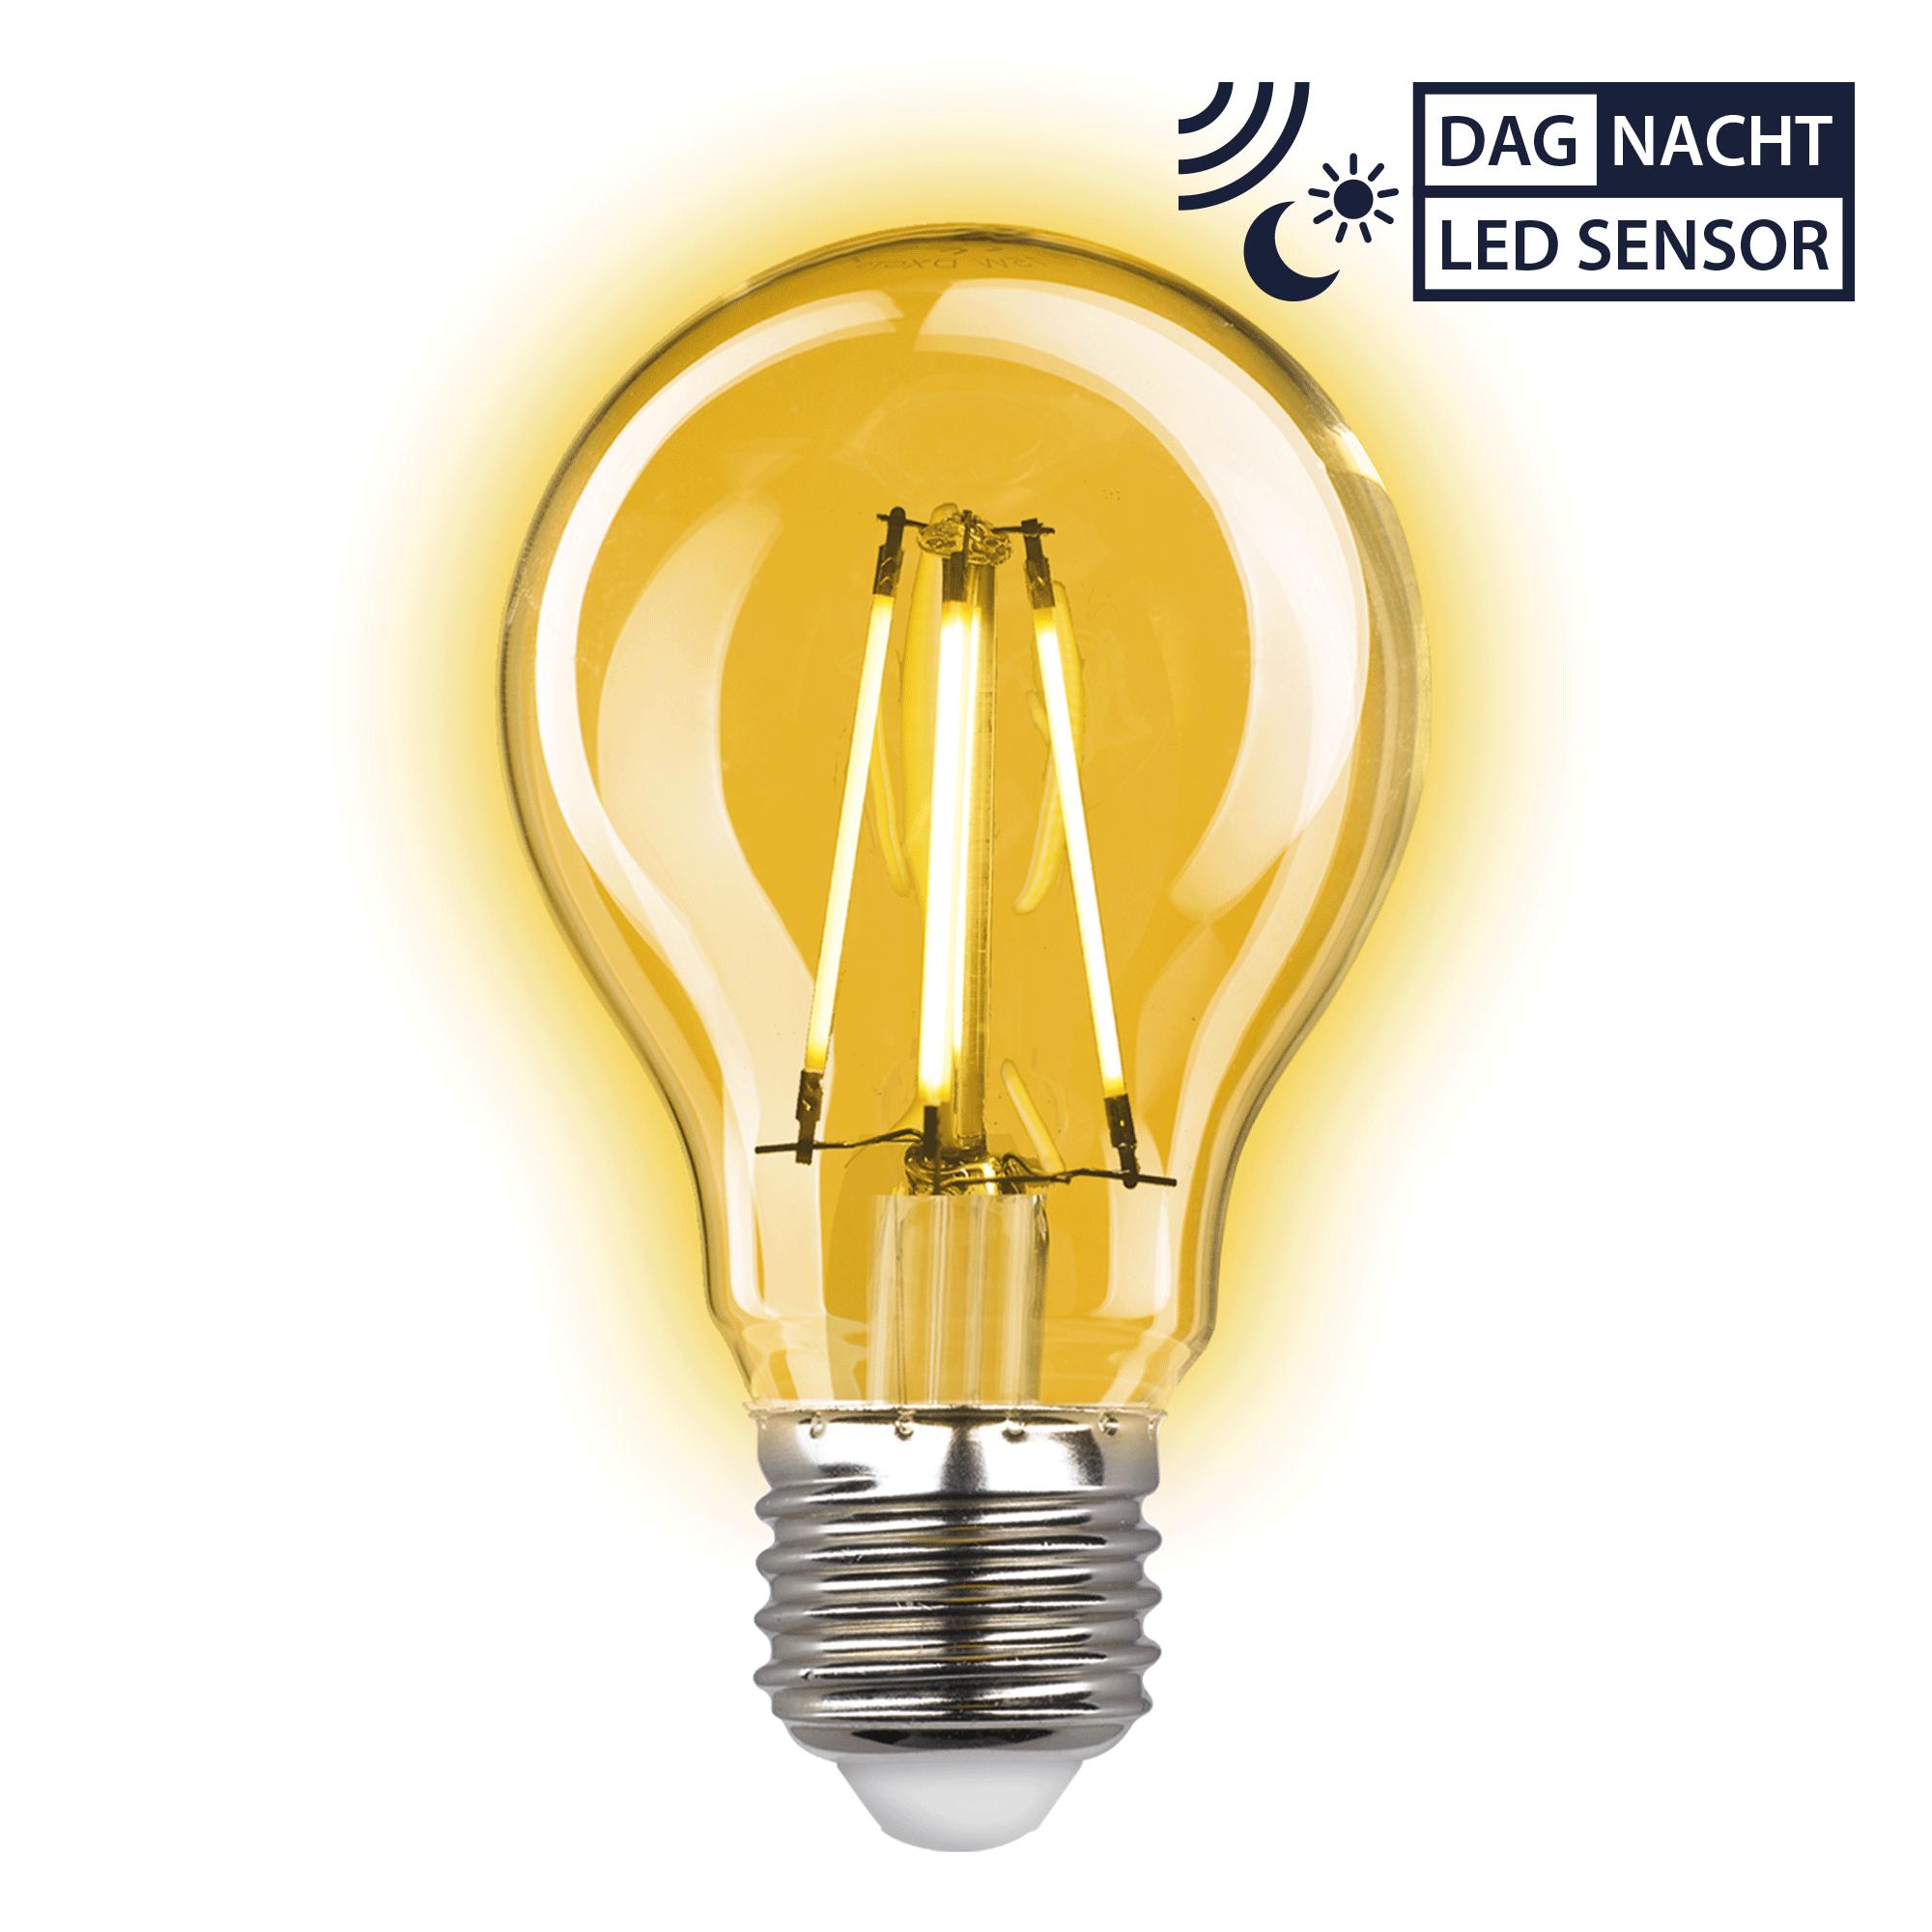 LED mit Tag/Nacht-Sensor